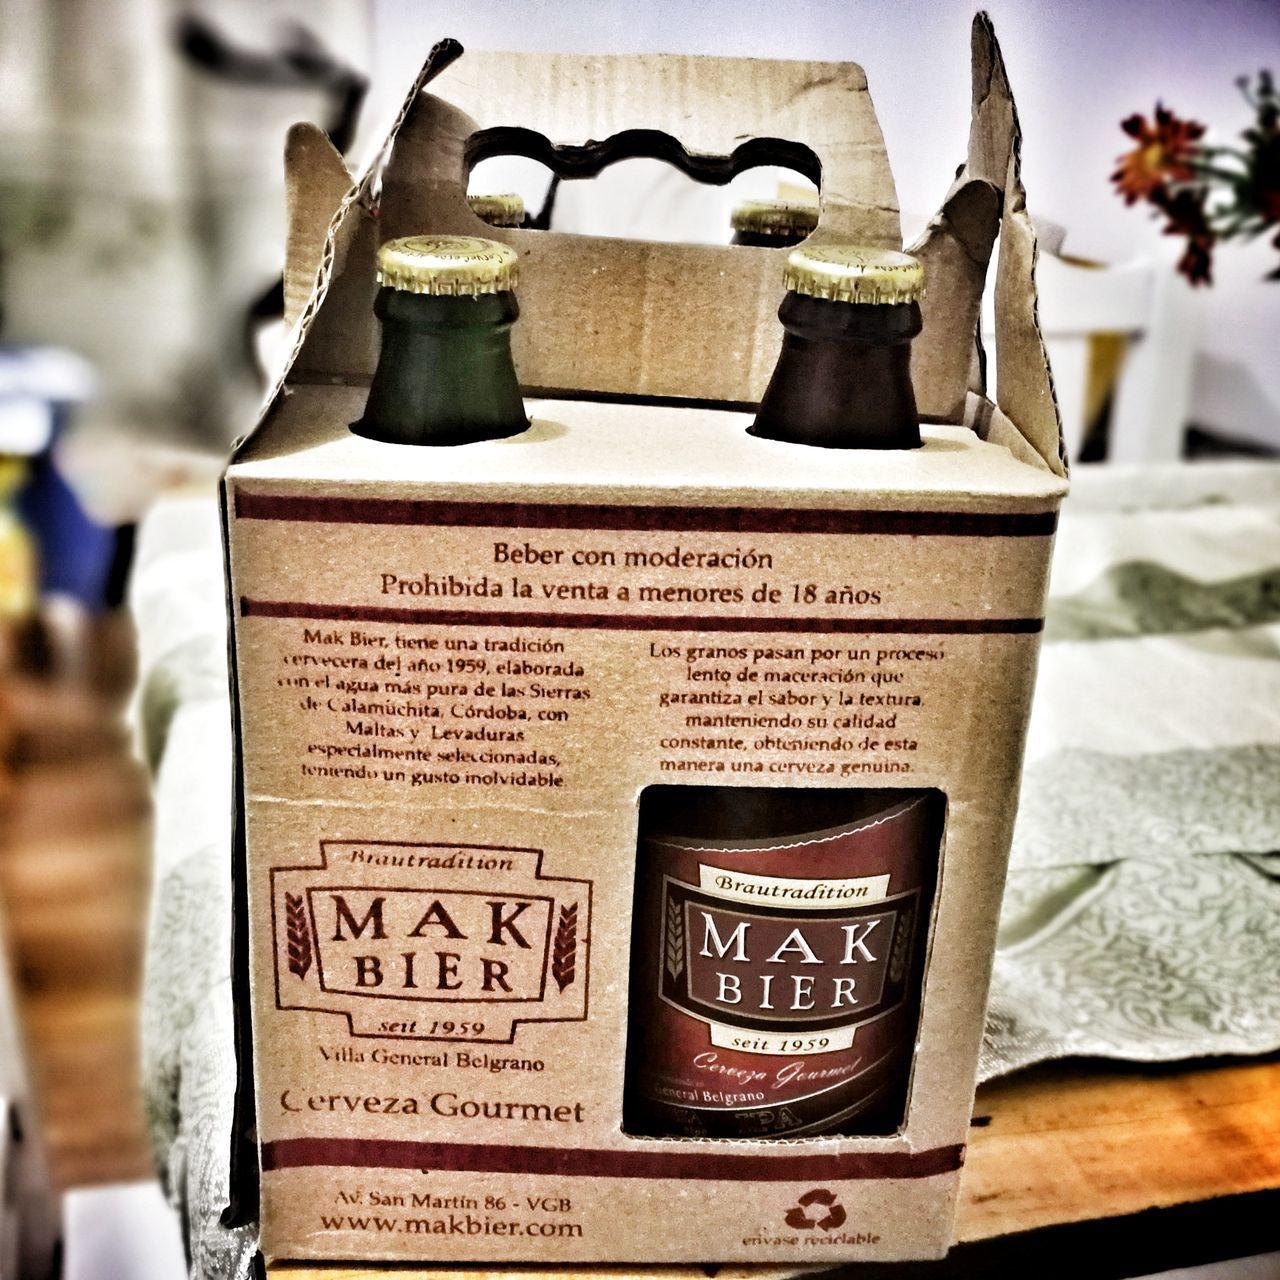 Cervezaartesanal Beer Craftbeer Box Carton Box Beer Box Huaweiphotography Huaweimobile Huaweimate9 Huawei Mate 9